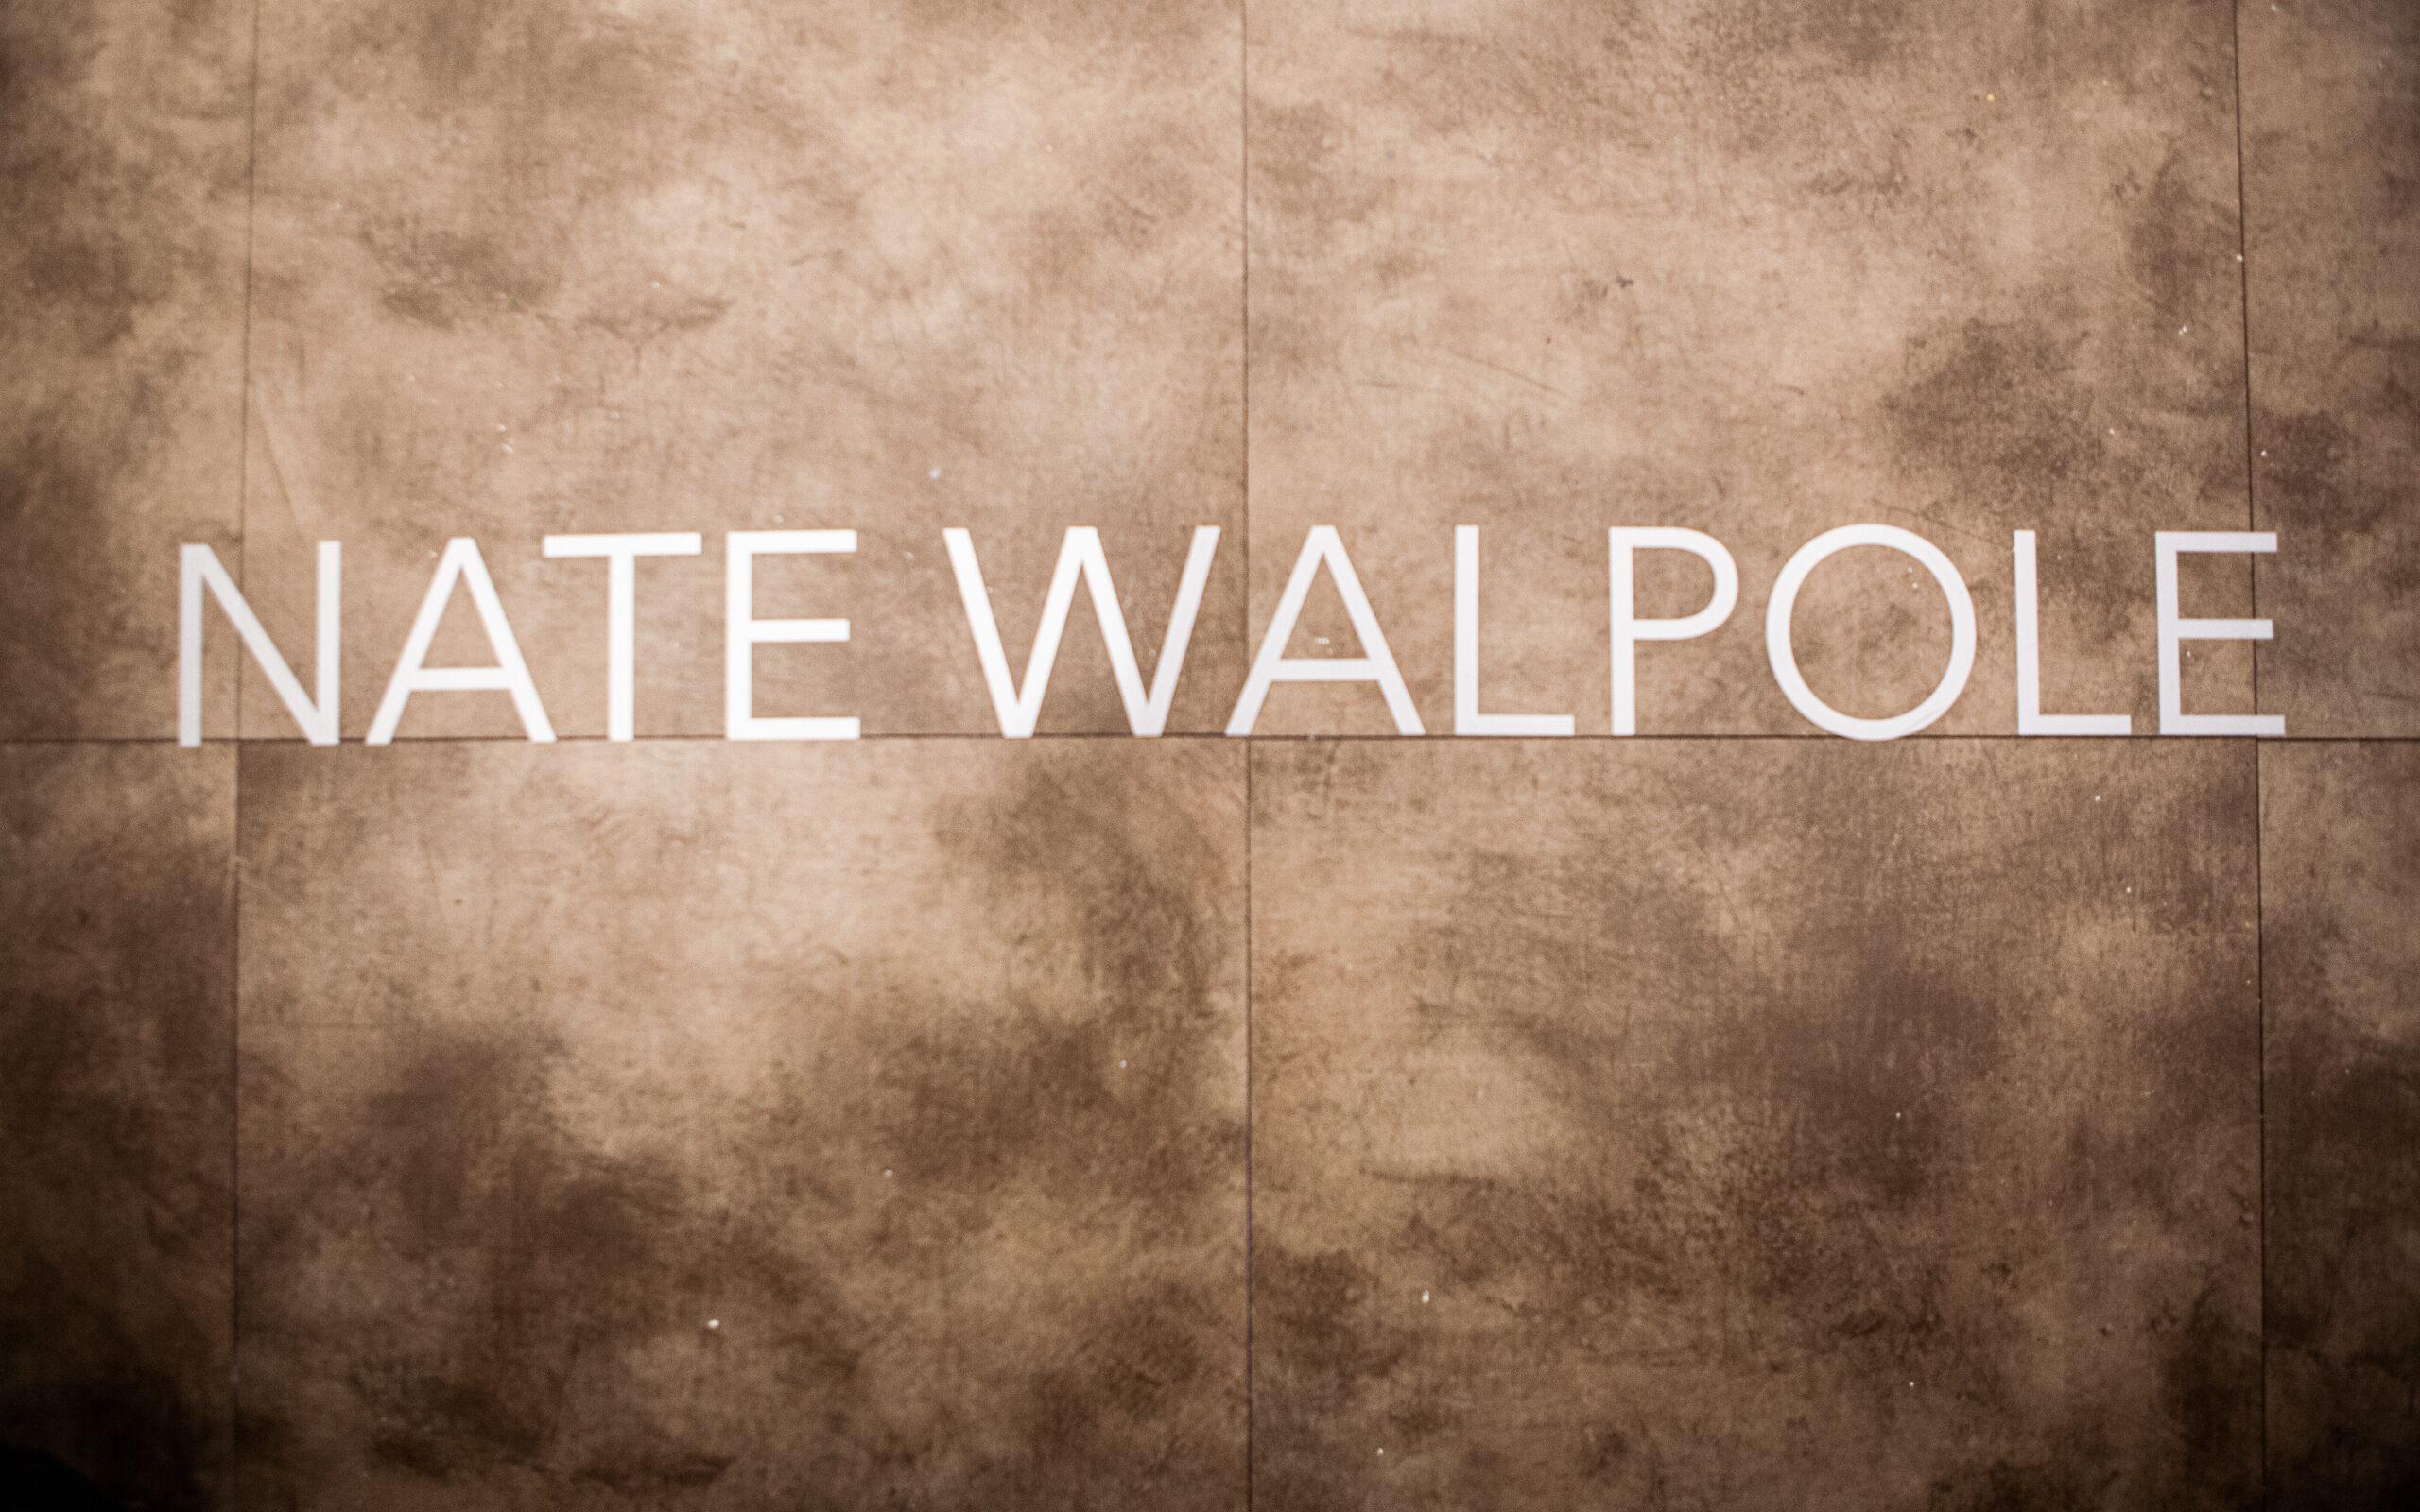 Nate Walpole's Name